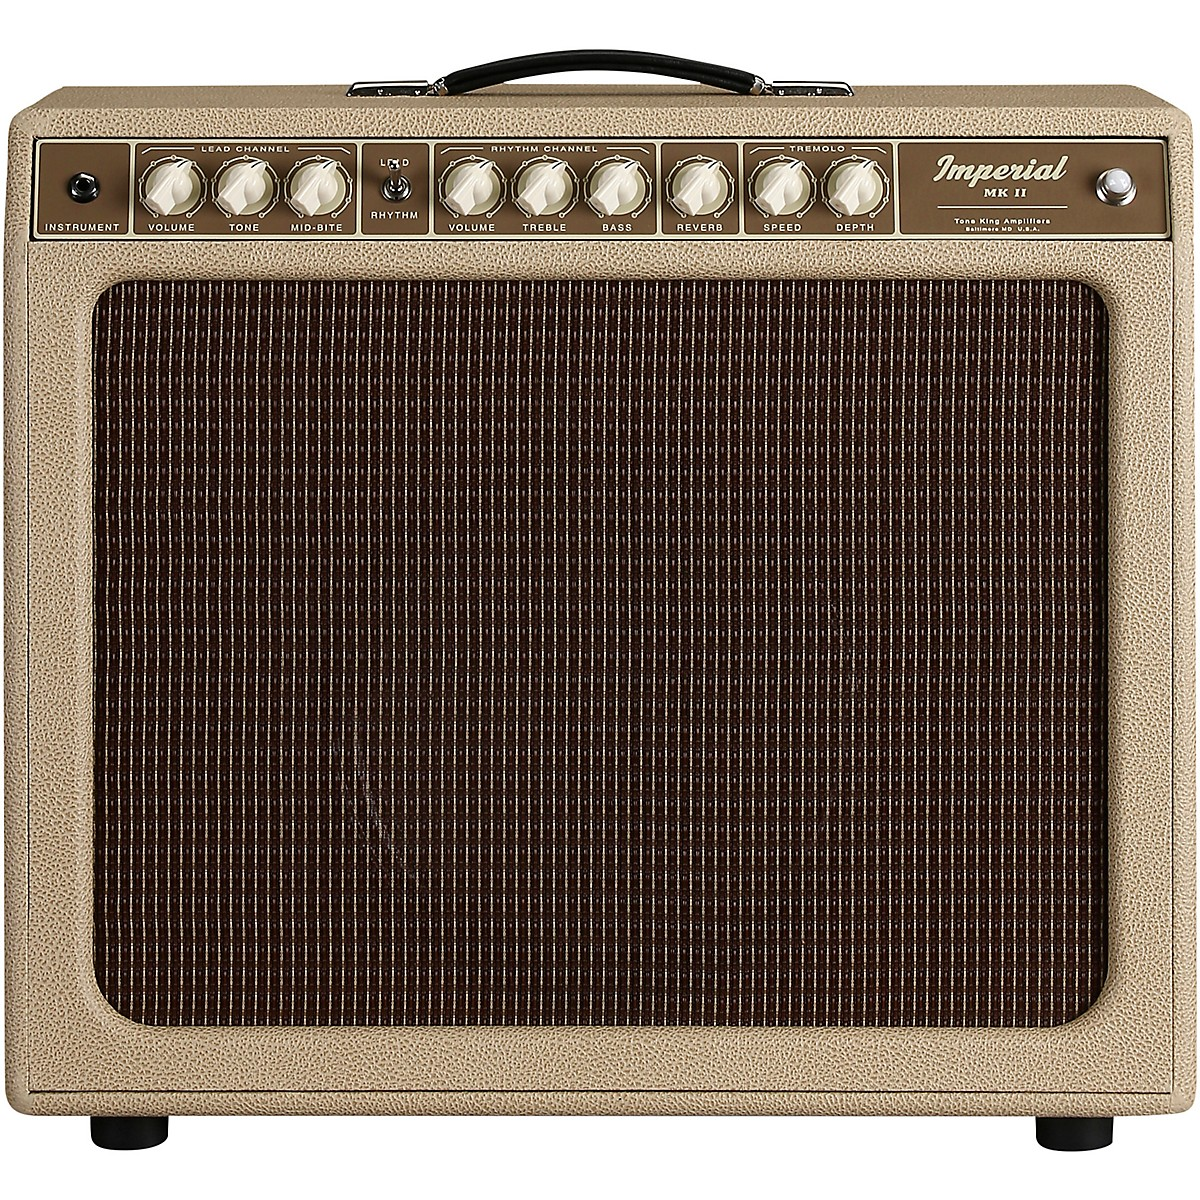 Tone King Imperial MKII 20W 1x12 Tube Guitar Combo Amp